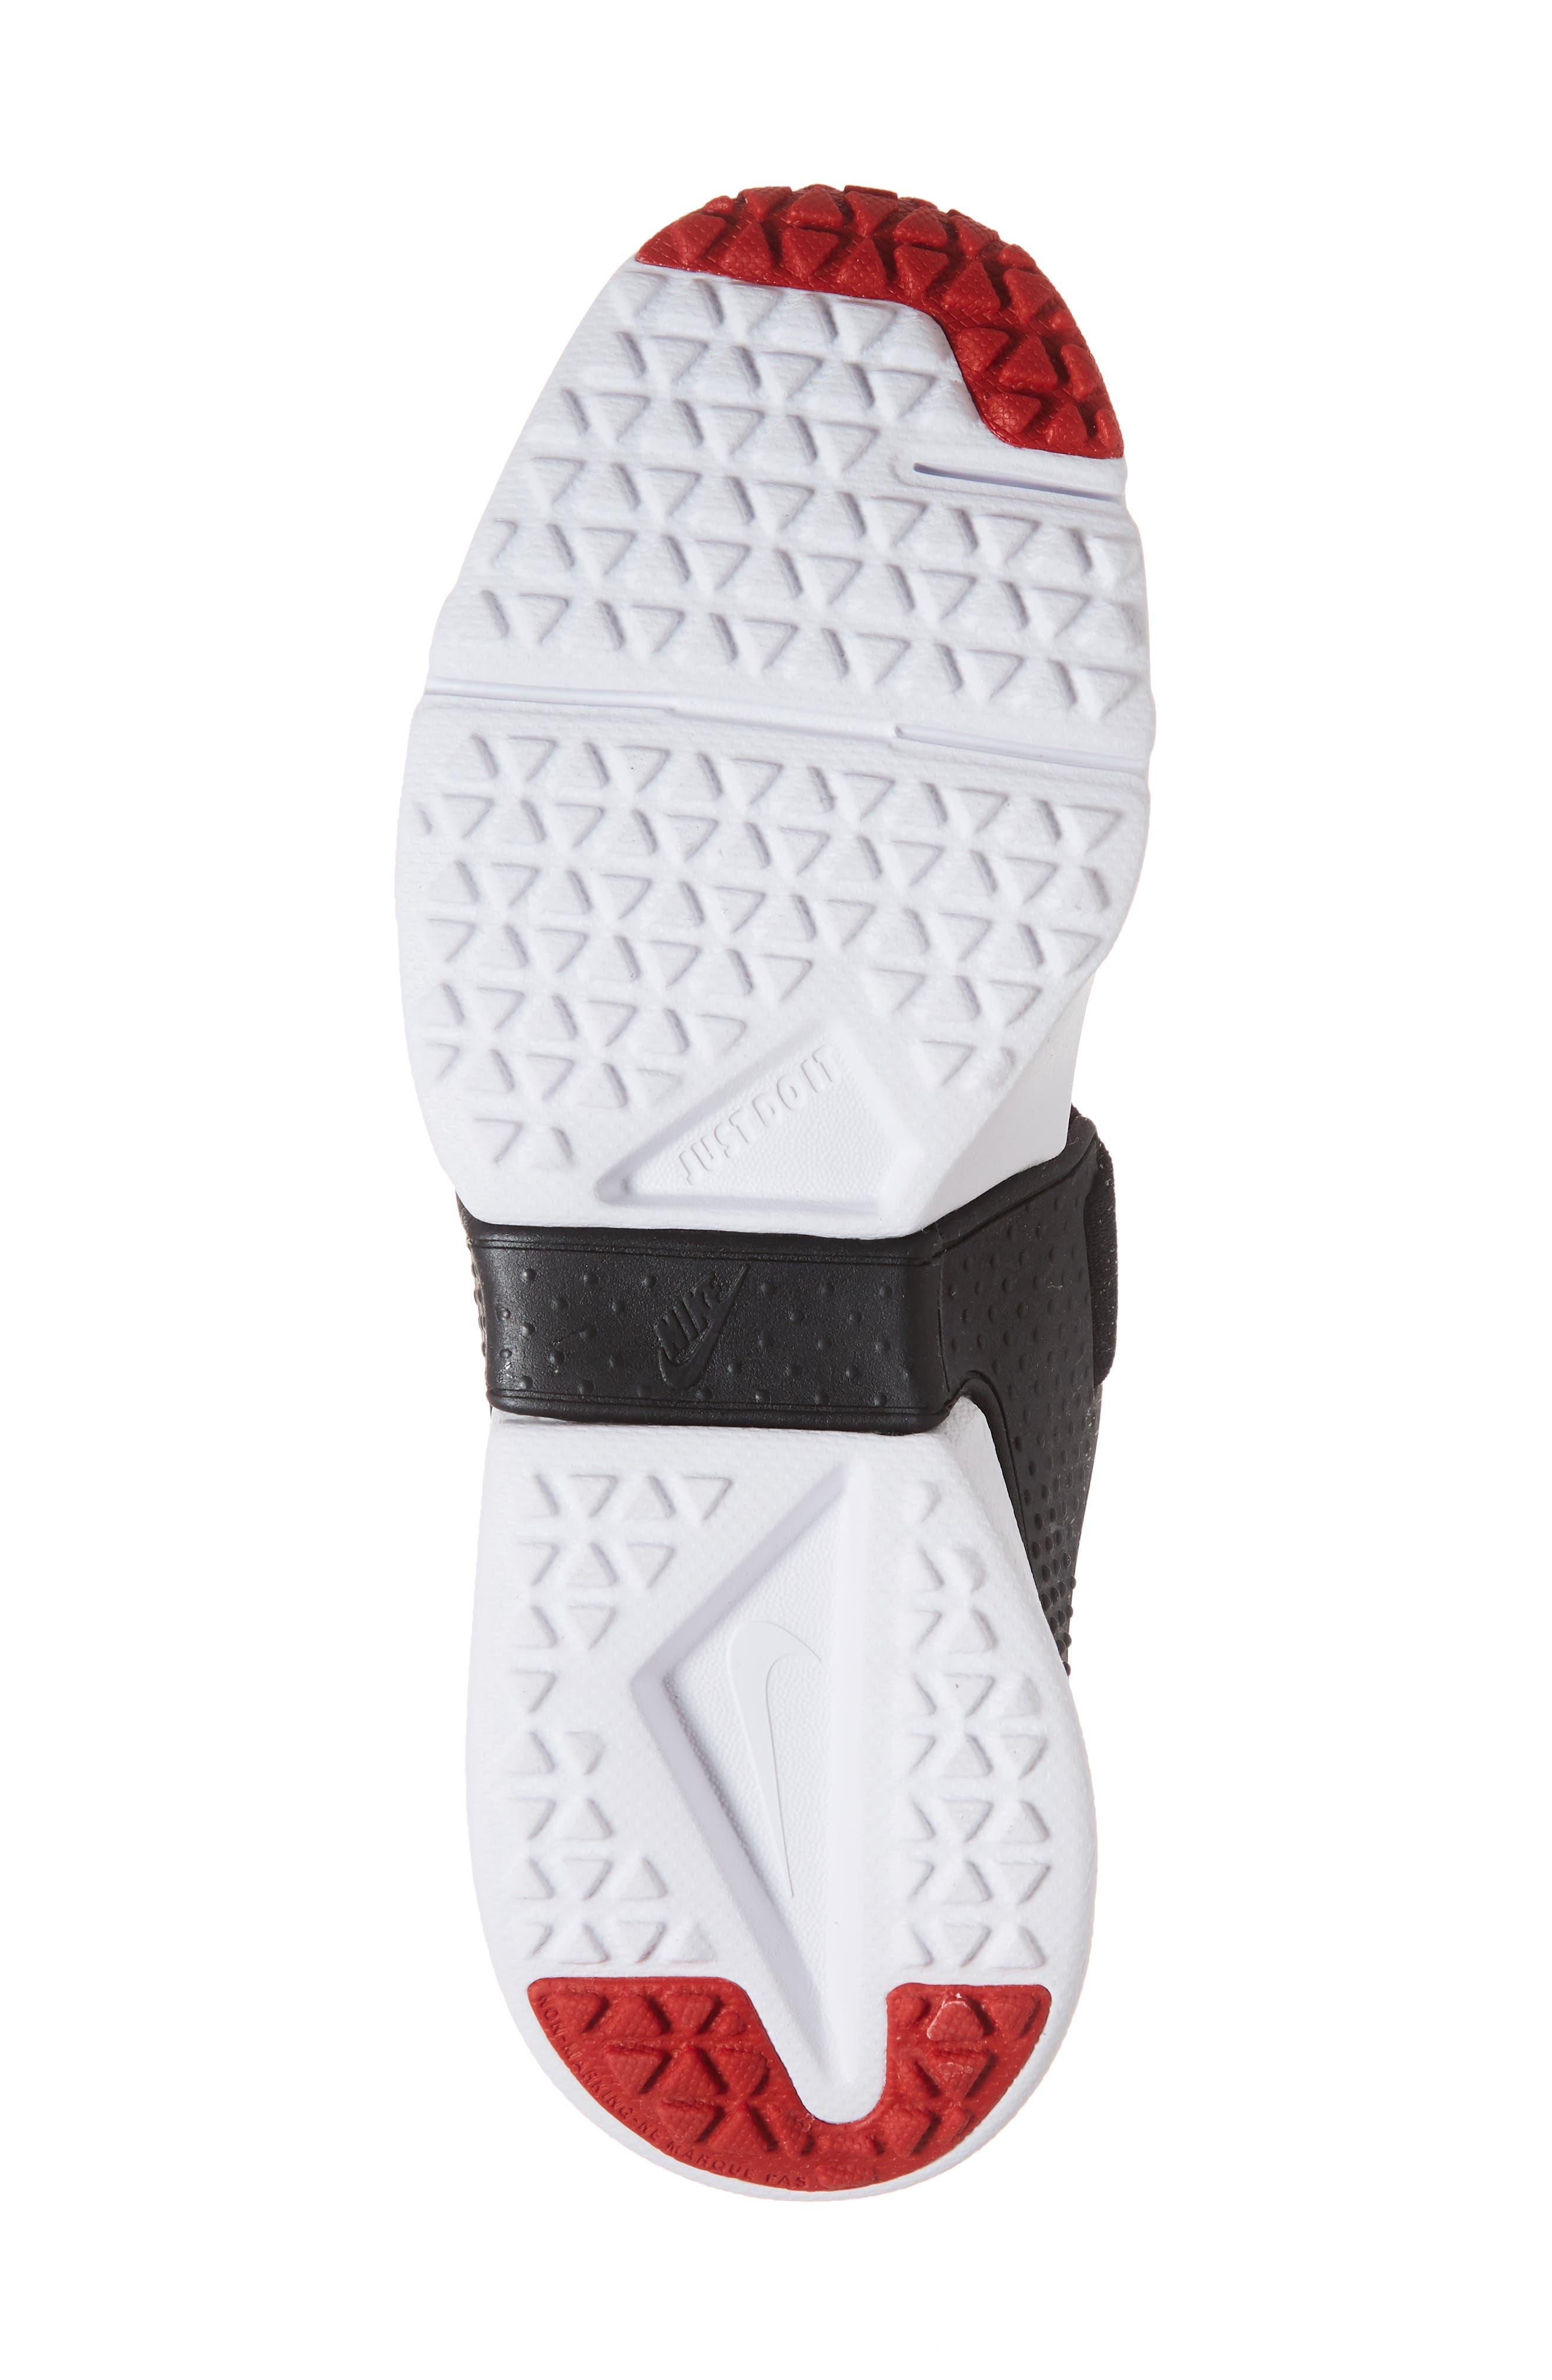 Huarache Extreme Sneaker,                             Alternate thumbnail 6, color,                             RED/ GREY/ BLACK/ WHITE